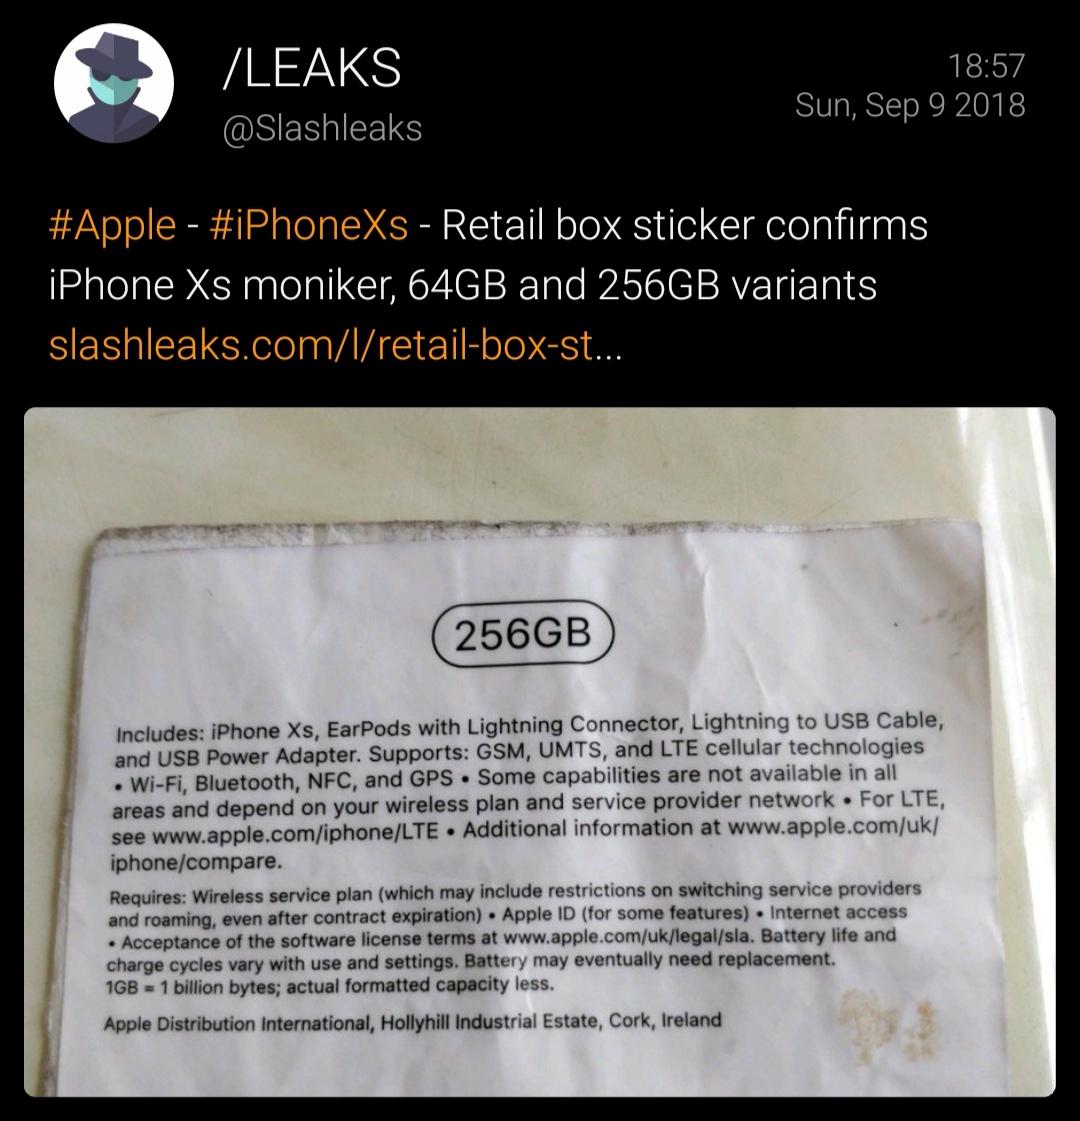 Slashleaks就在刚刚又分享了一张新图片:iPhone Xs的零售版说明书!